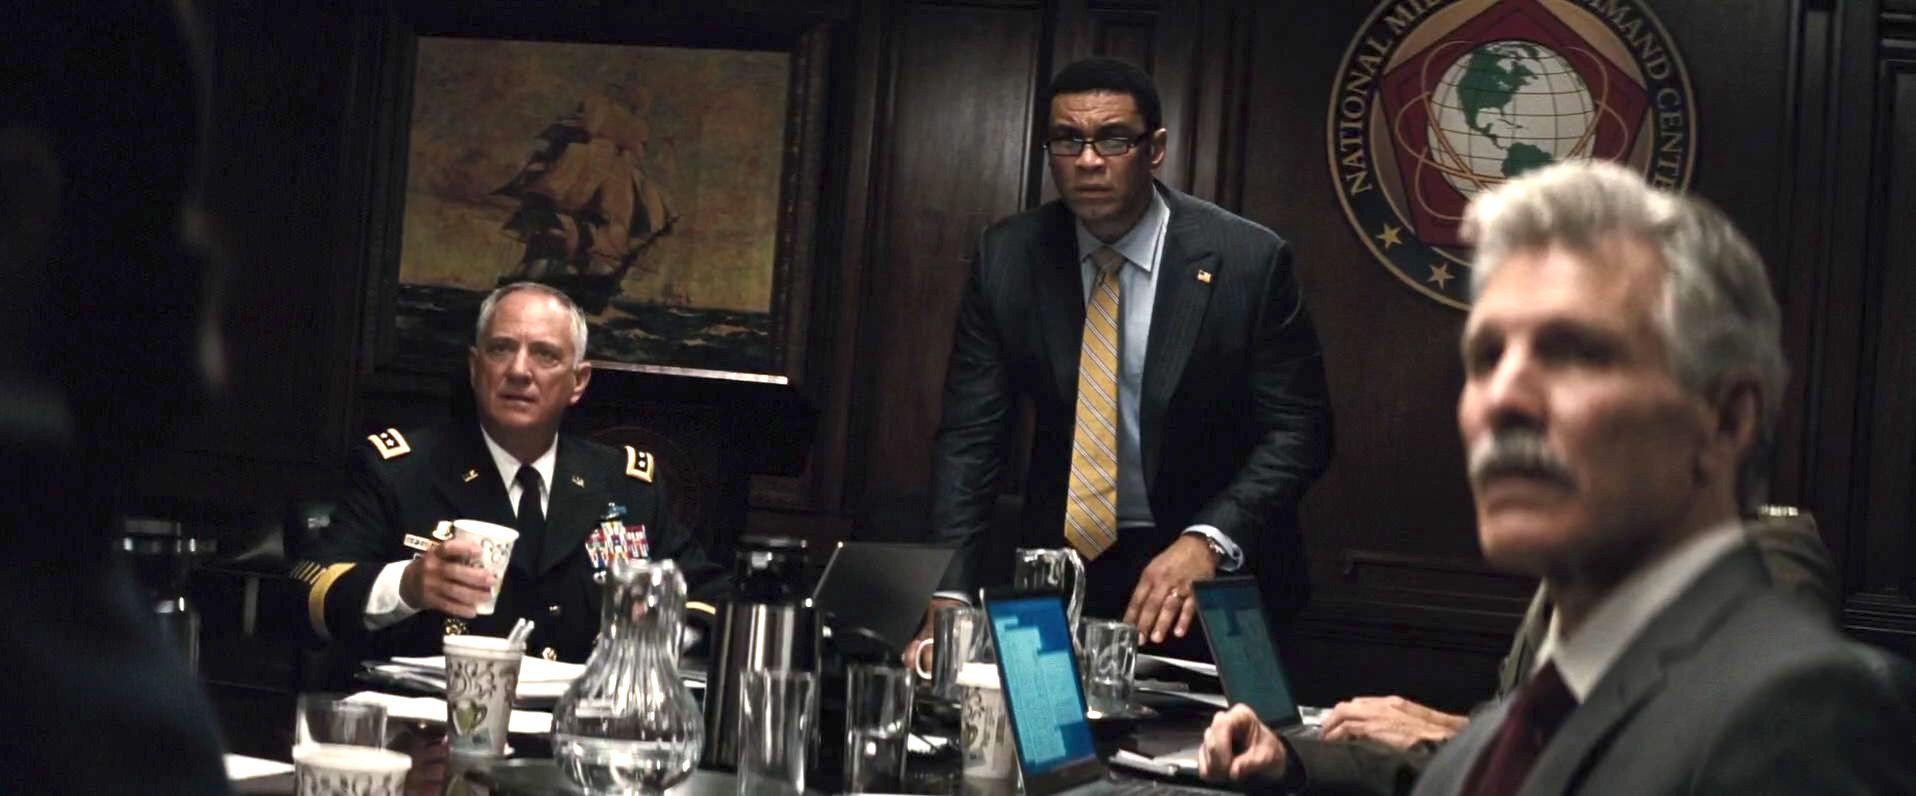 Harry Lennix and Greg Violand in Batman v Superman: Dawn of Justice (2016)